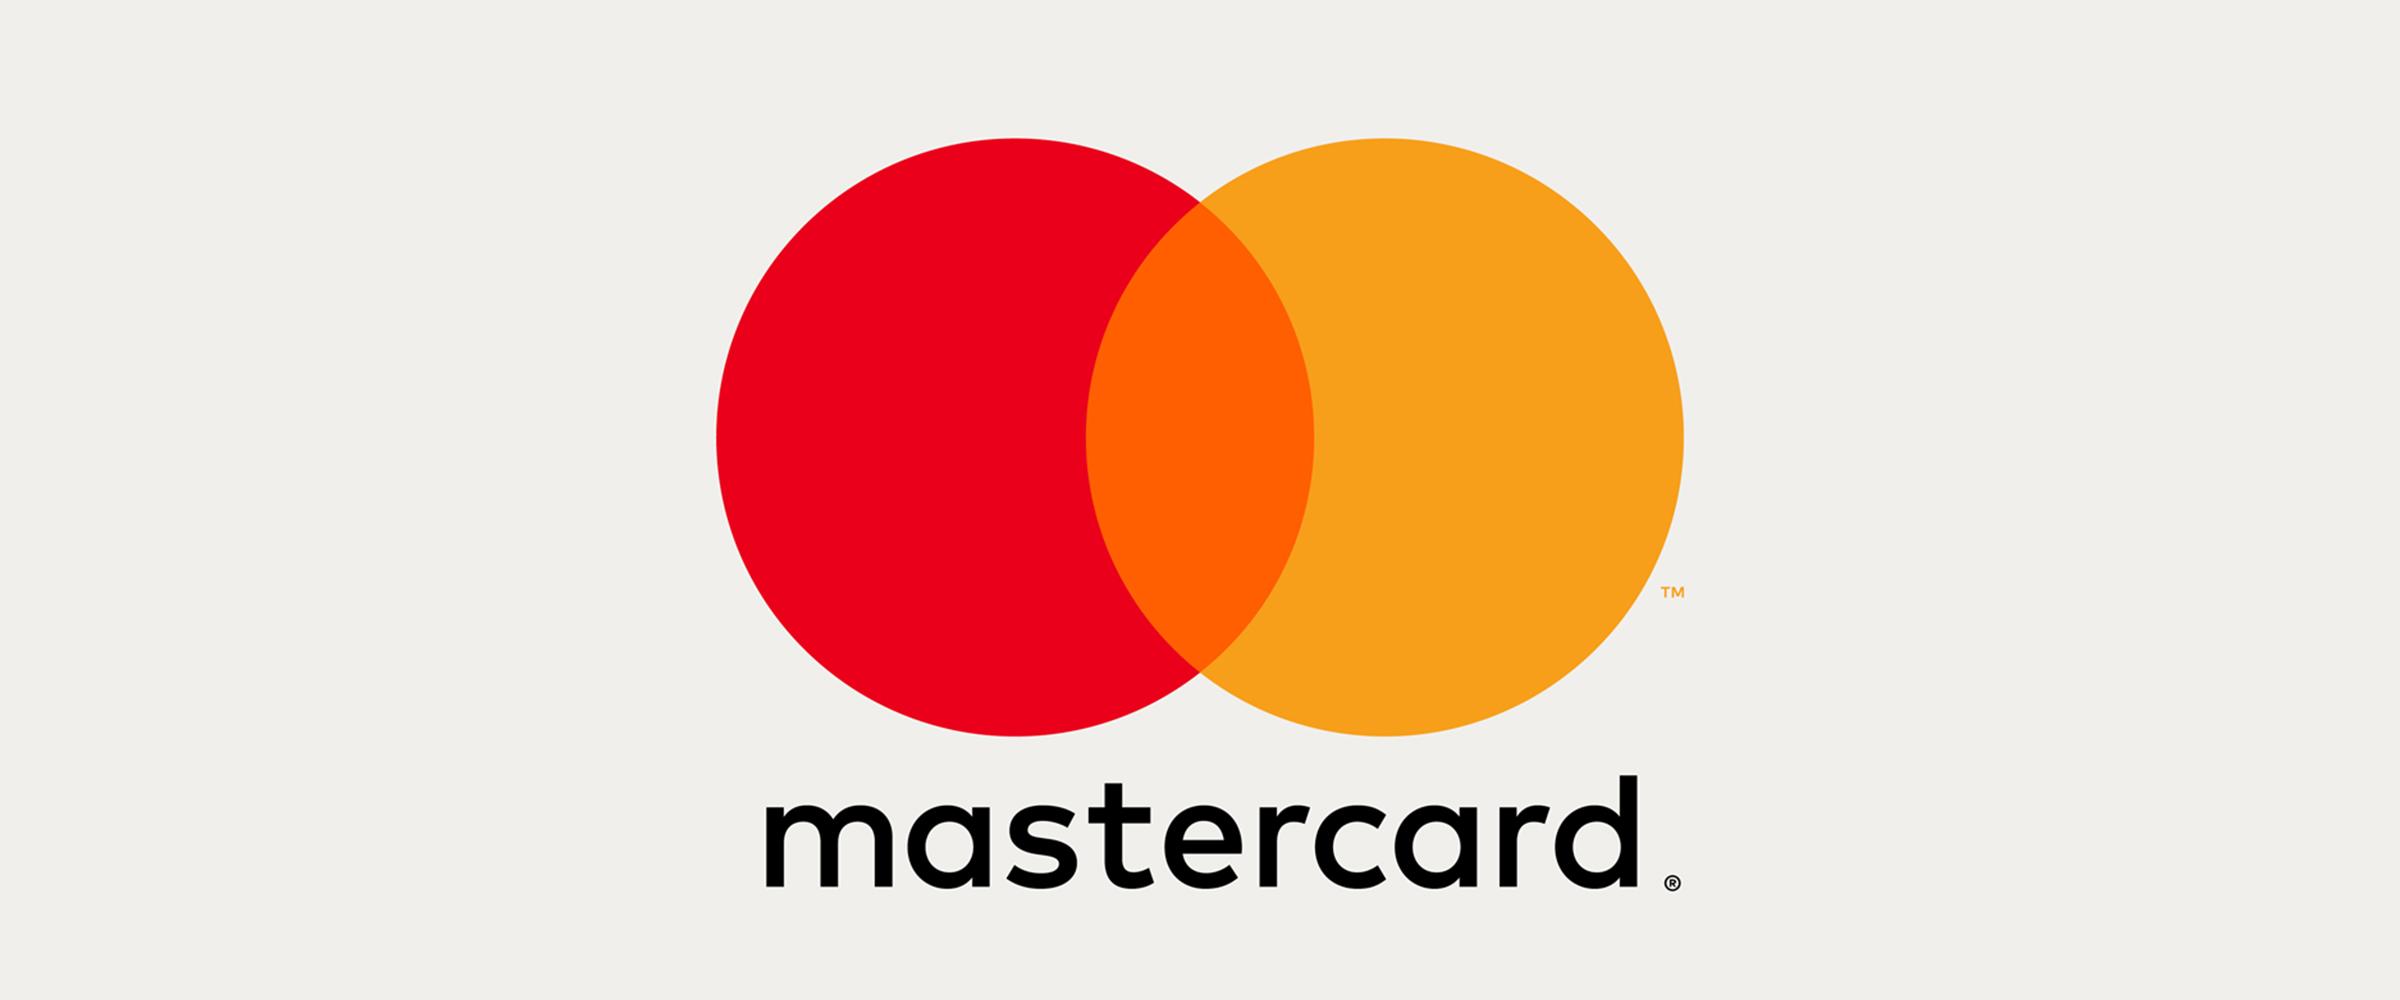 MastercardHeader2